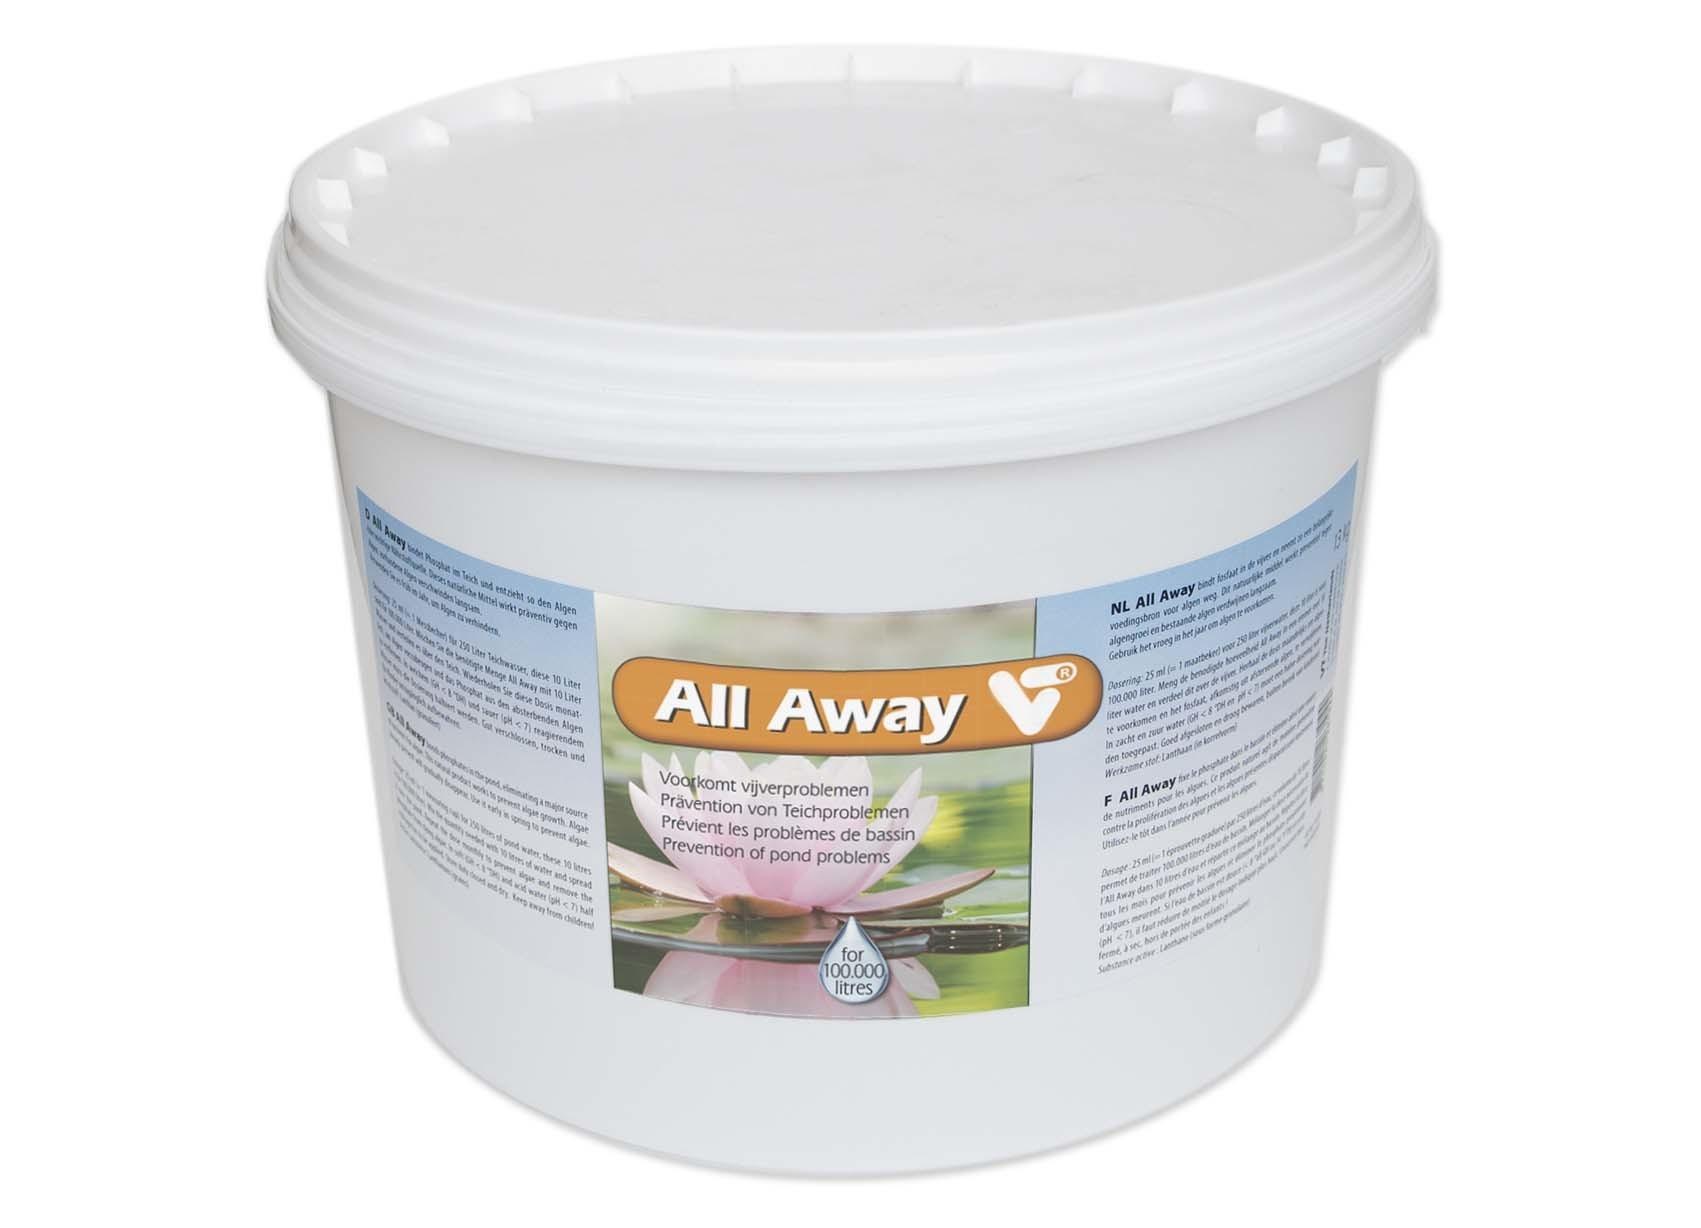 All Away - 13 Kilo | Velda